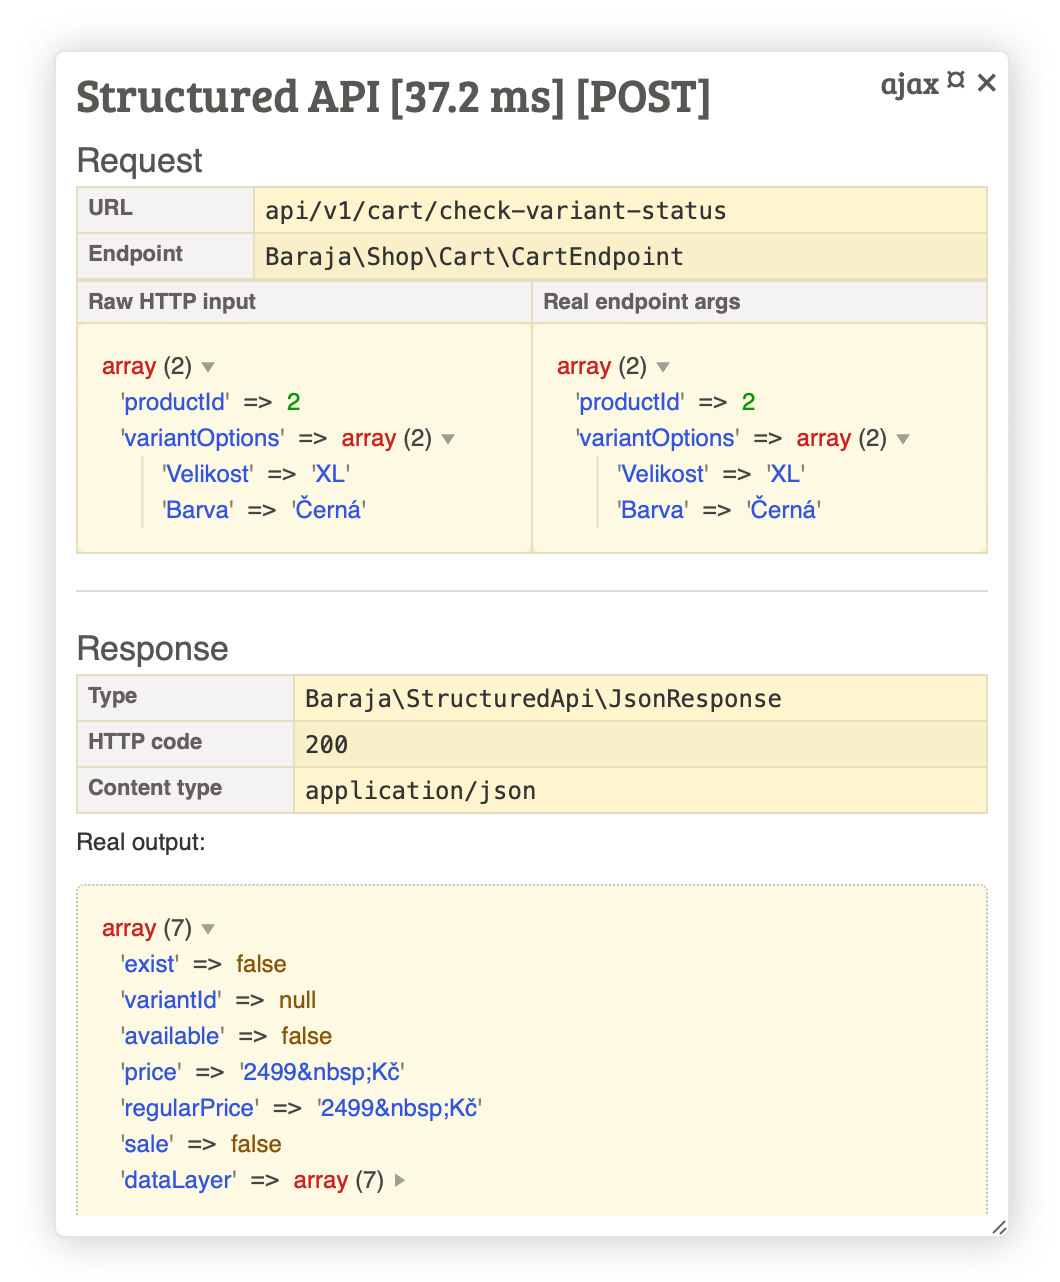 Baraja Structured API debug Tracy panel